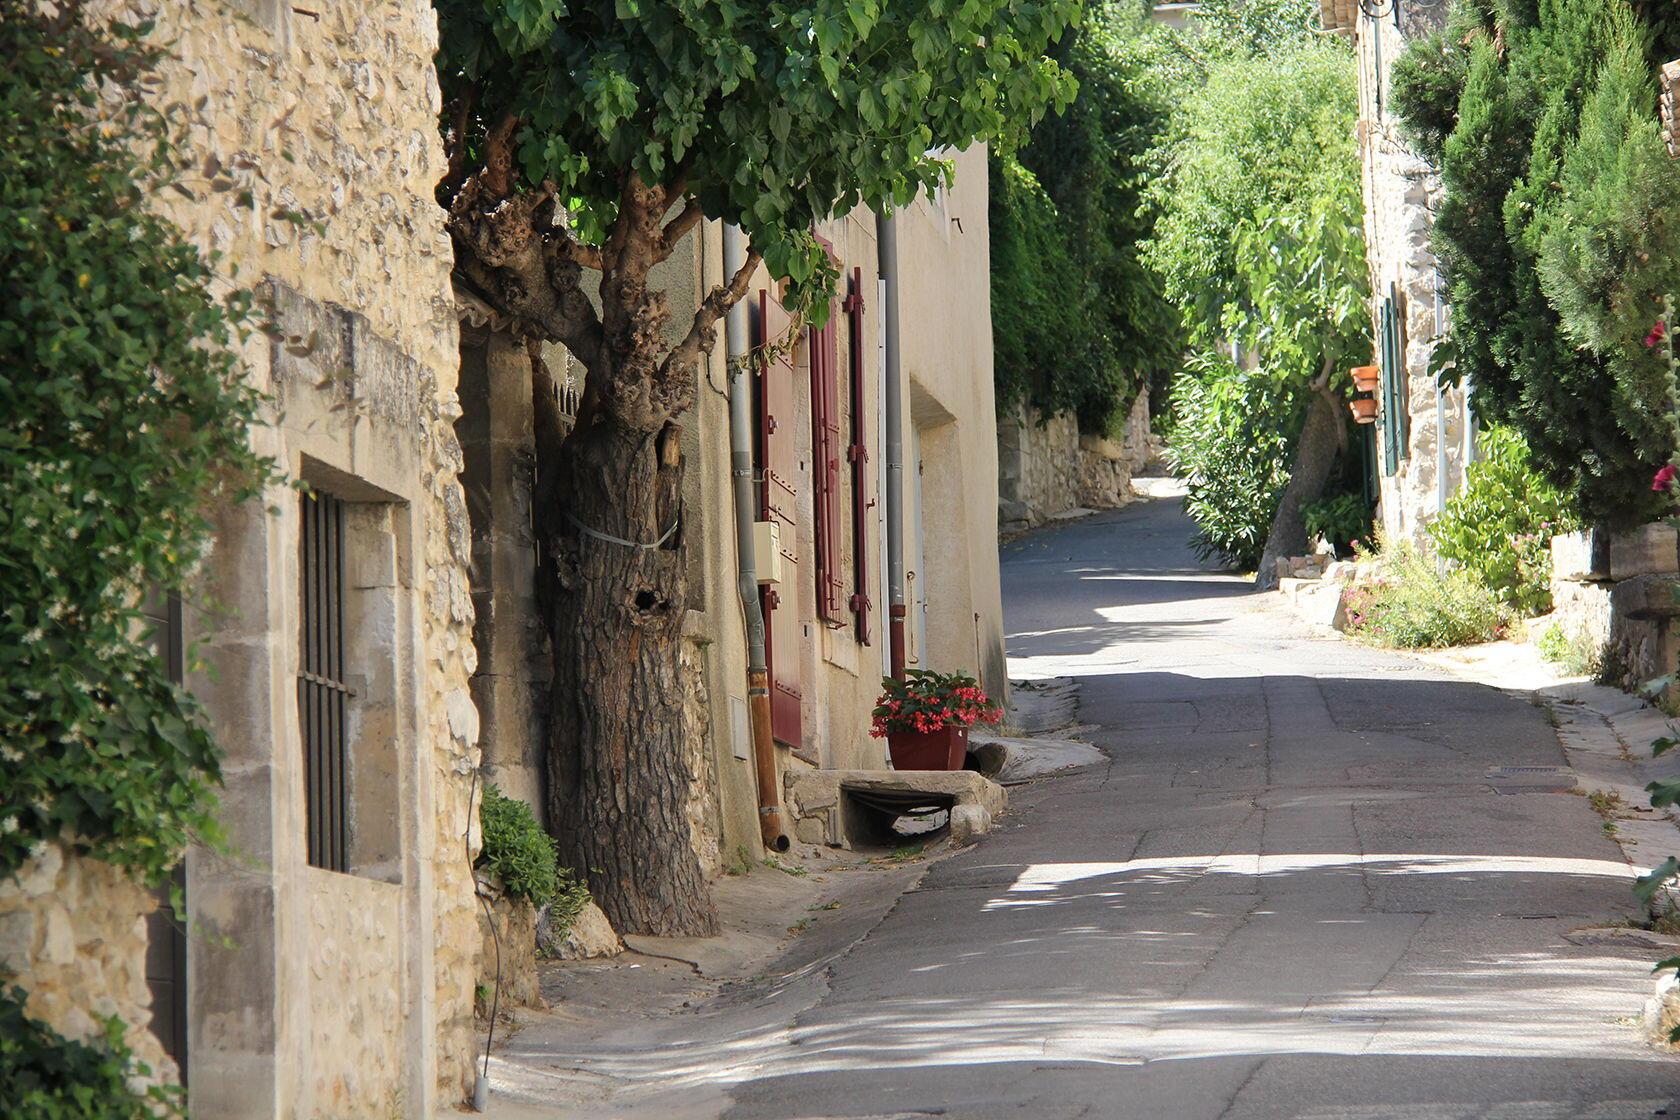 Eygalieres Rue Parneuve